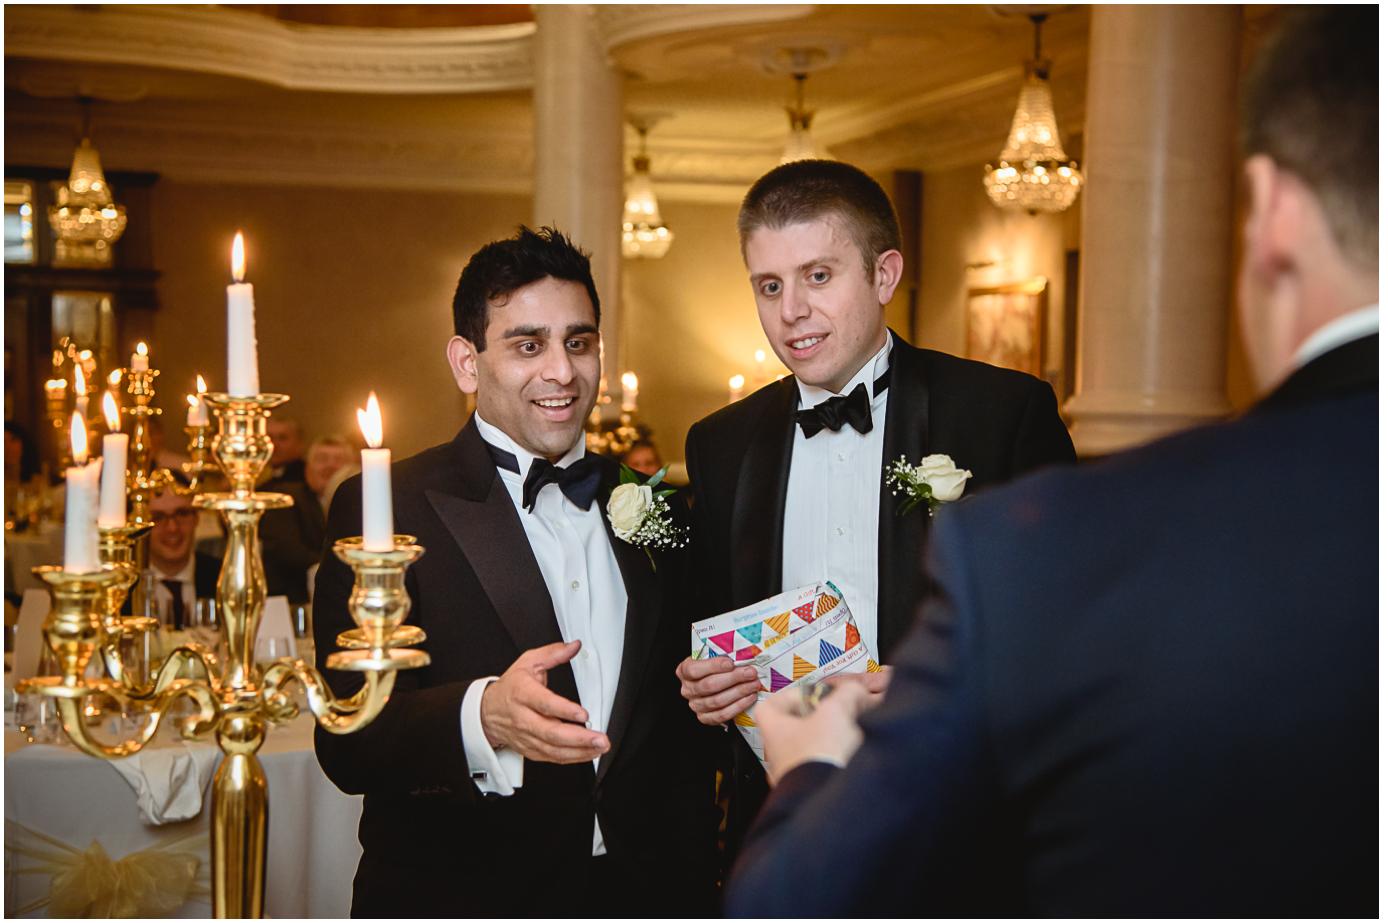 73 - Esmat and Angus - St. Ermin's Hotel London wedding photographer